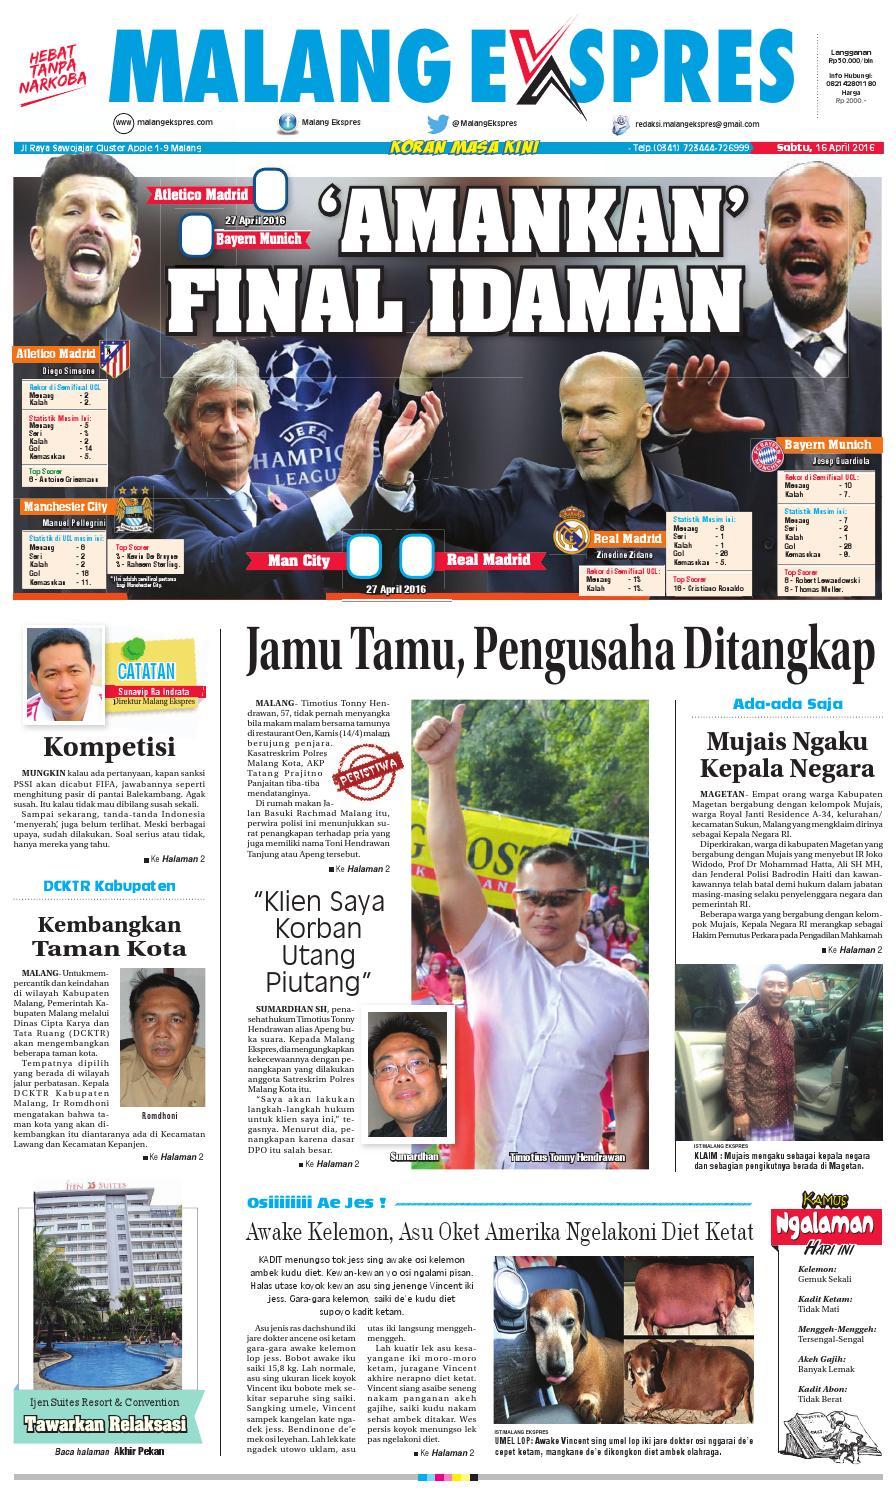 Malang Ekspres Ed Sabtu 16 April 2016 By Koran Produk Ukm Bumn Kain Batik Eksklusif Lasem Manuk Masa Kini Issuu